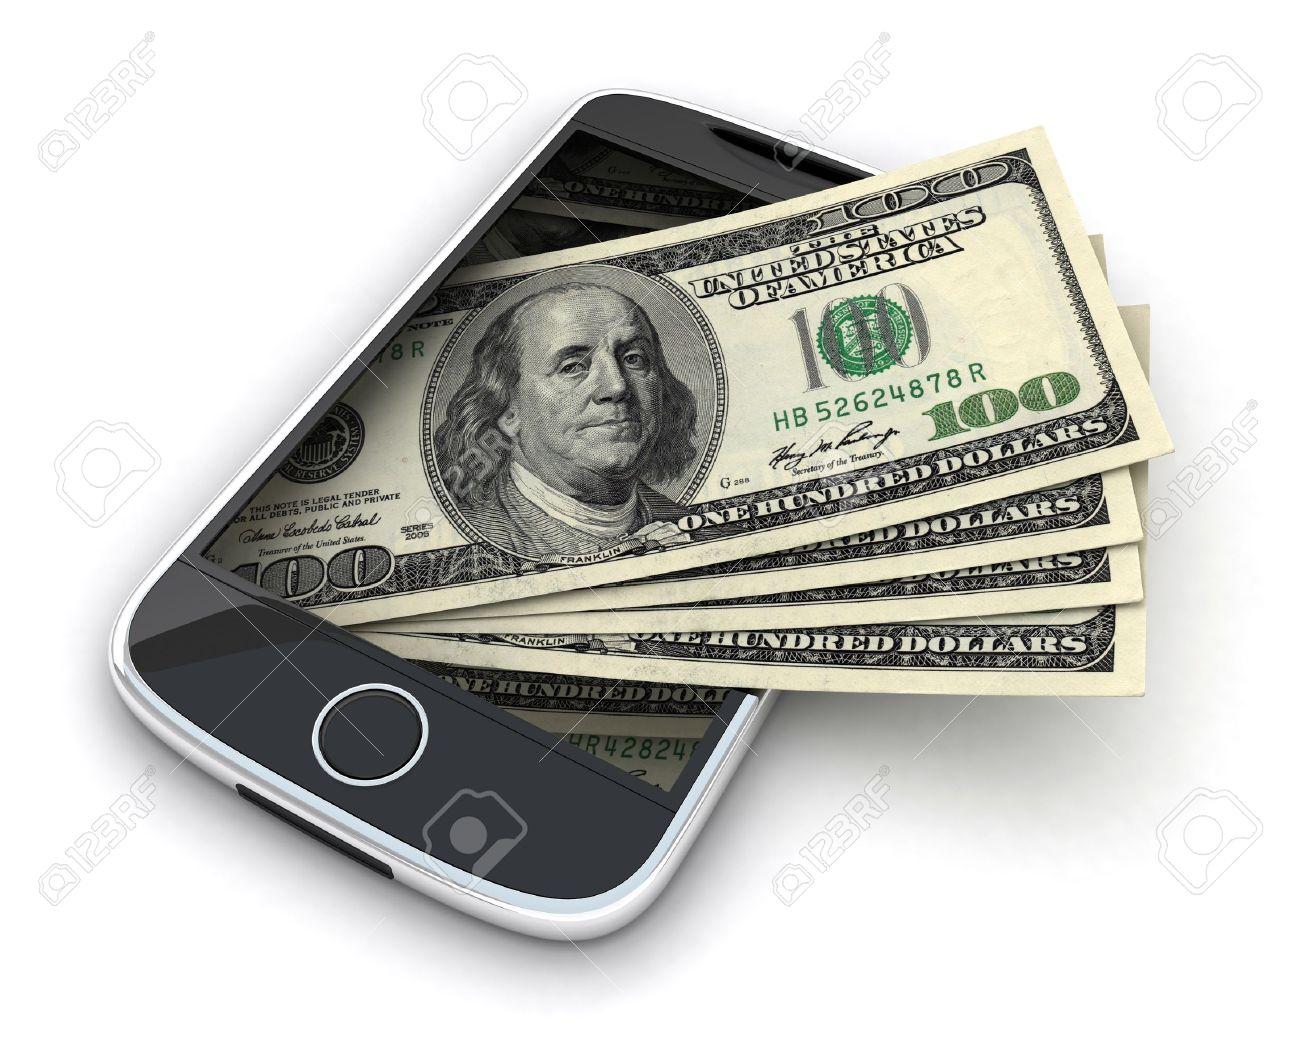 Отмена роуминга вернула рост цен намобильную связь